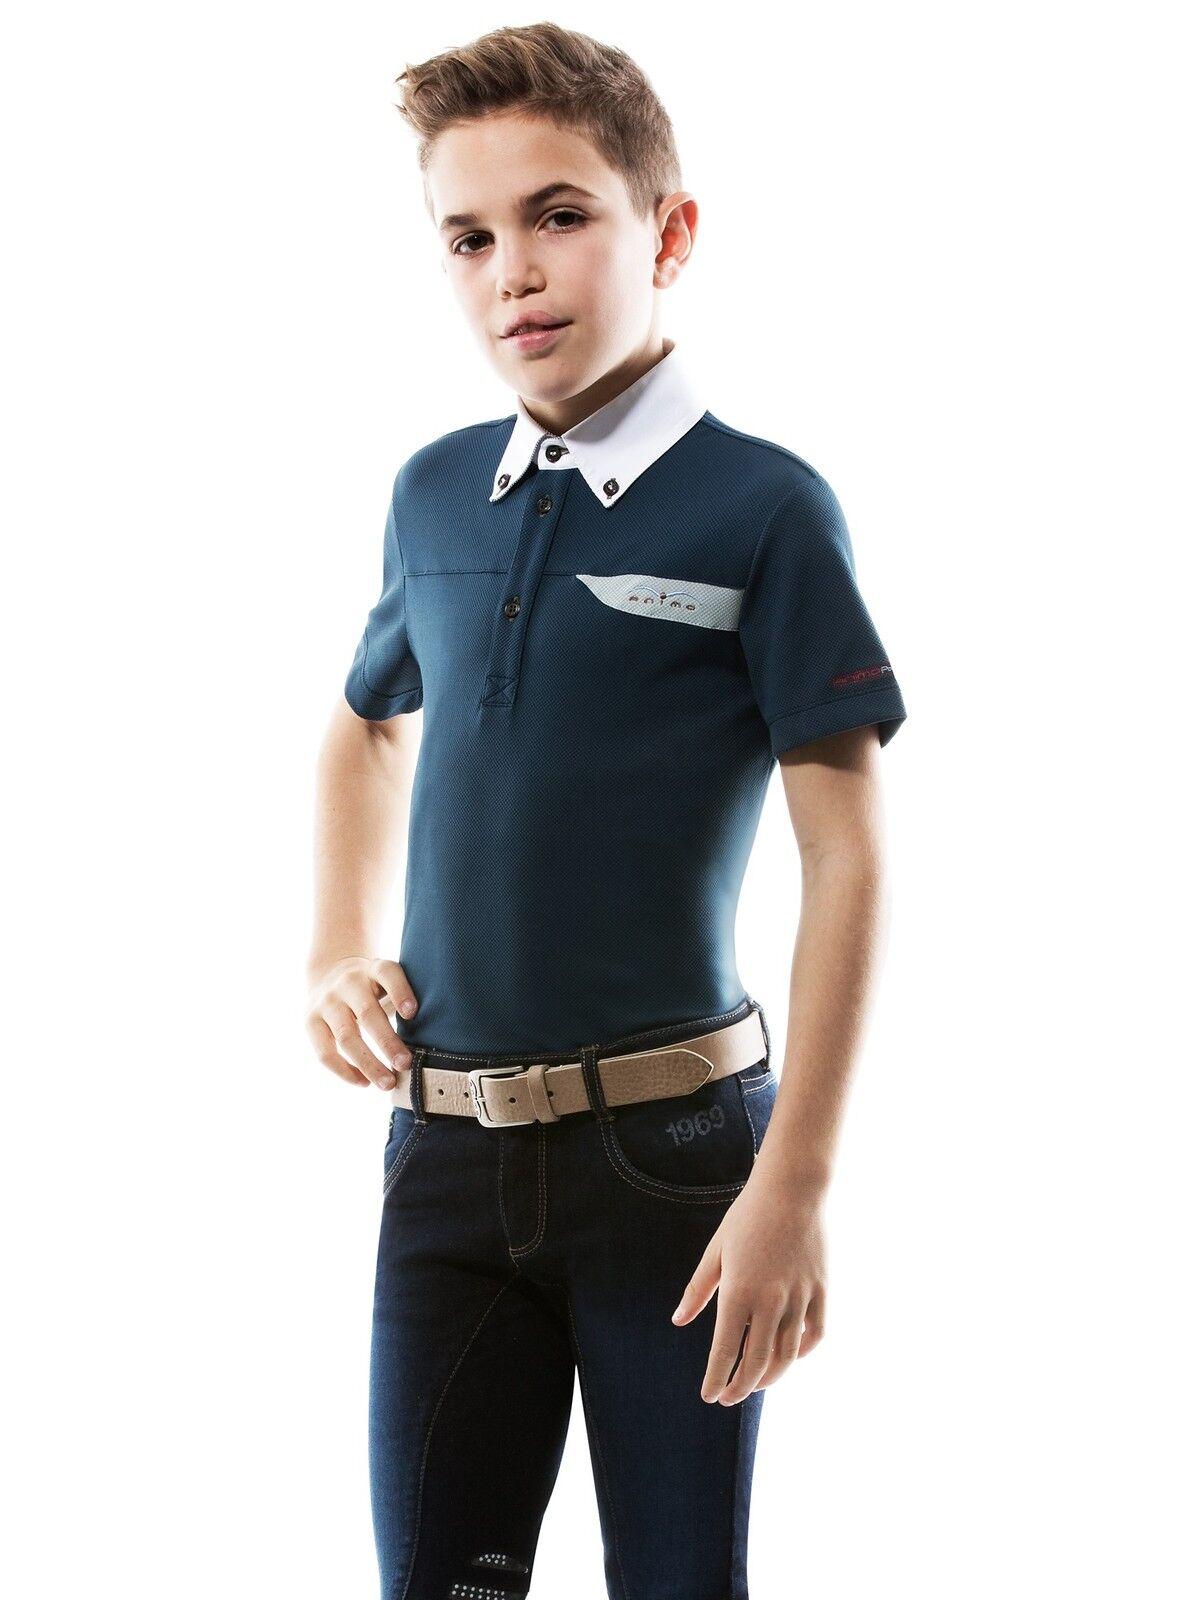 Animo Kinder Turniershirt Boy's Polo Polo Polo Atommy Fb. Safari NEU 089358